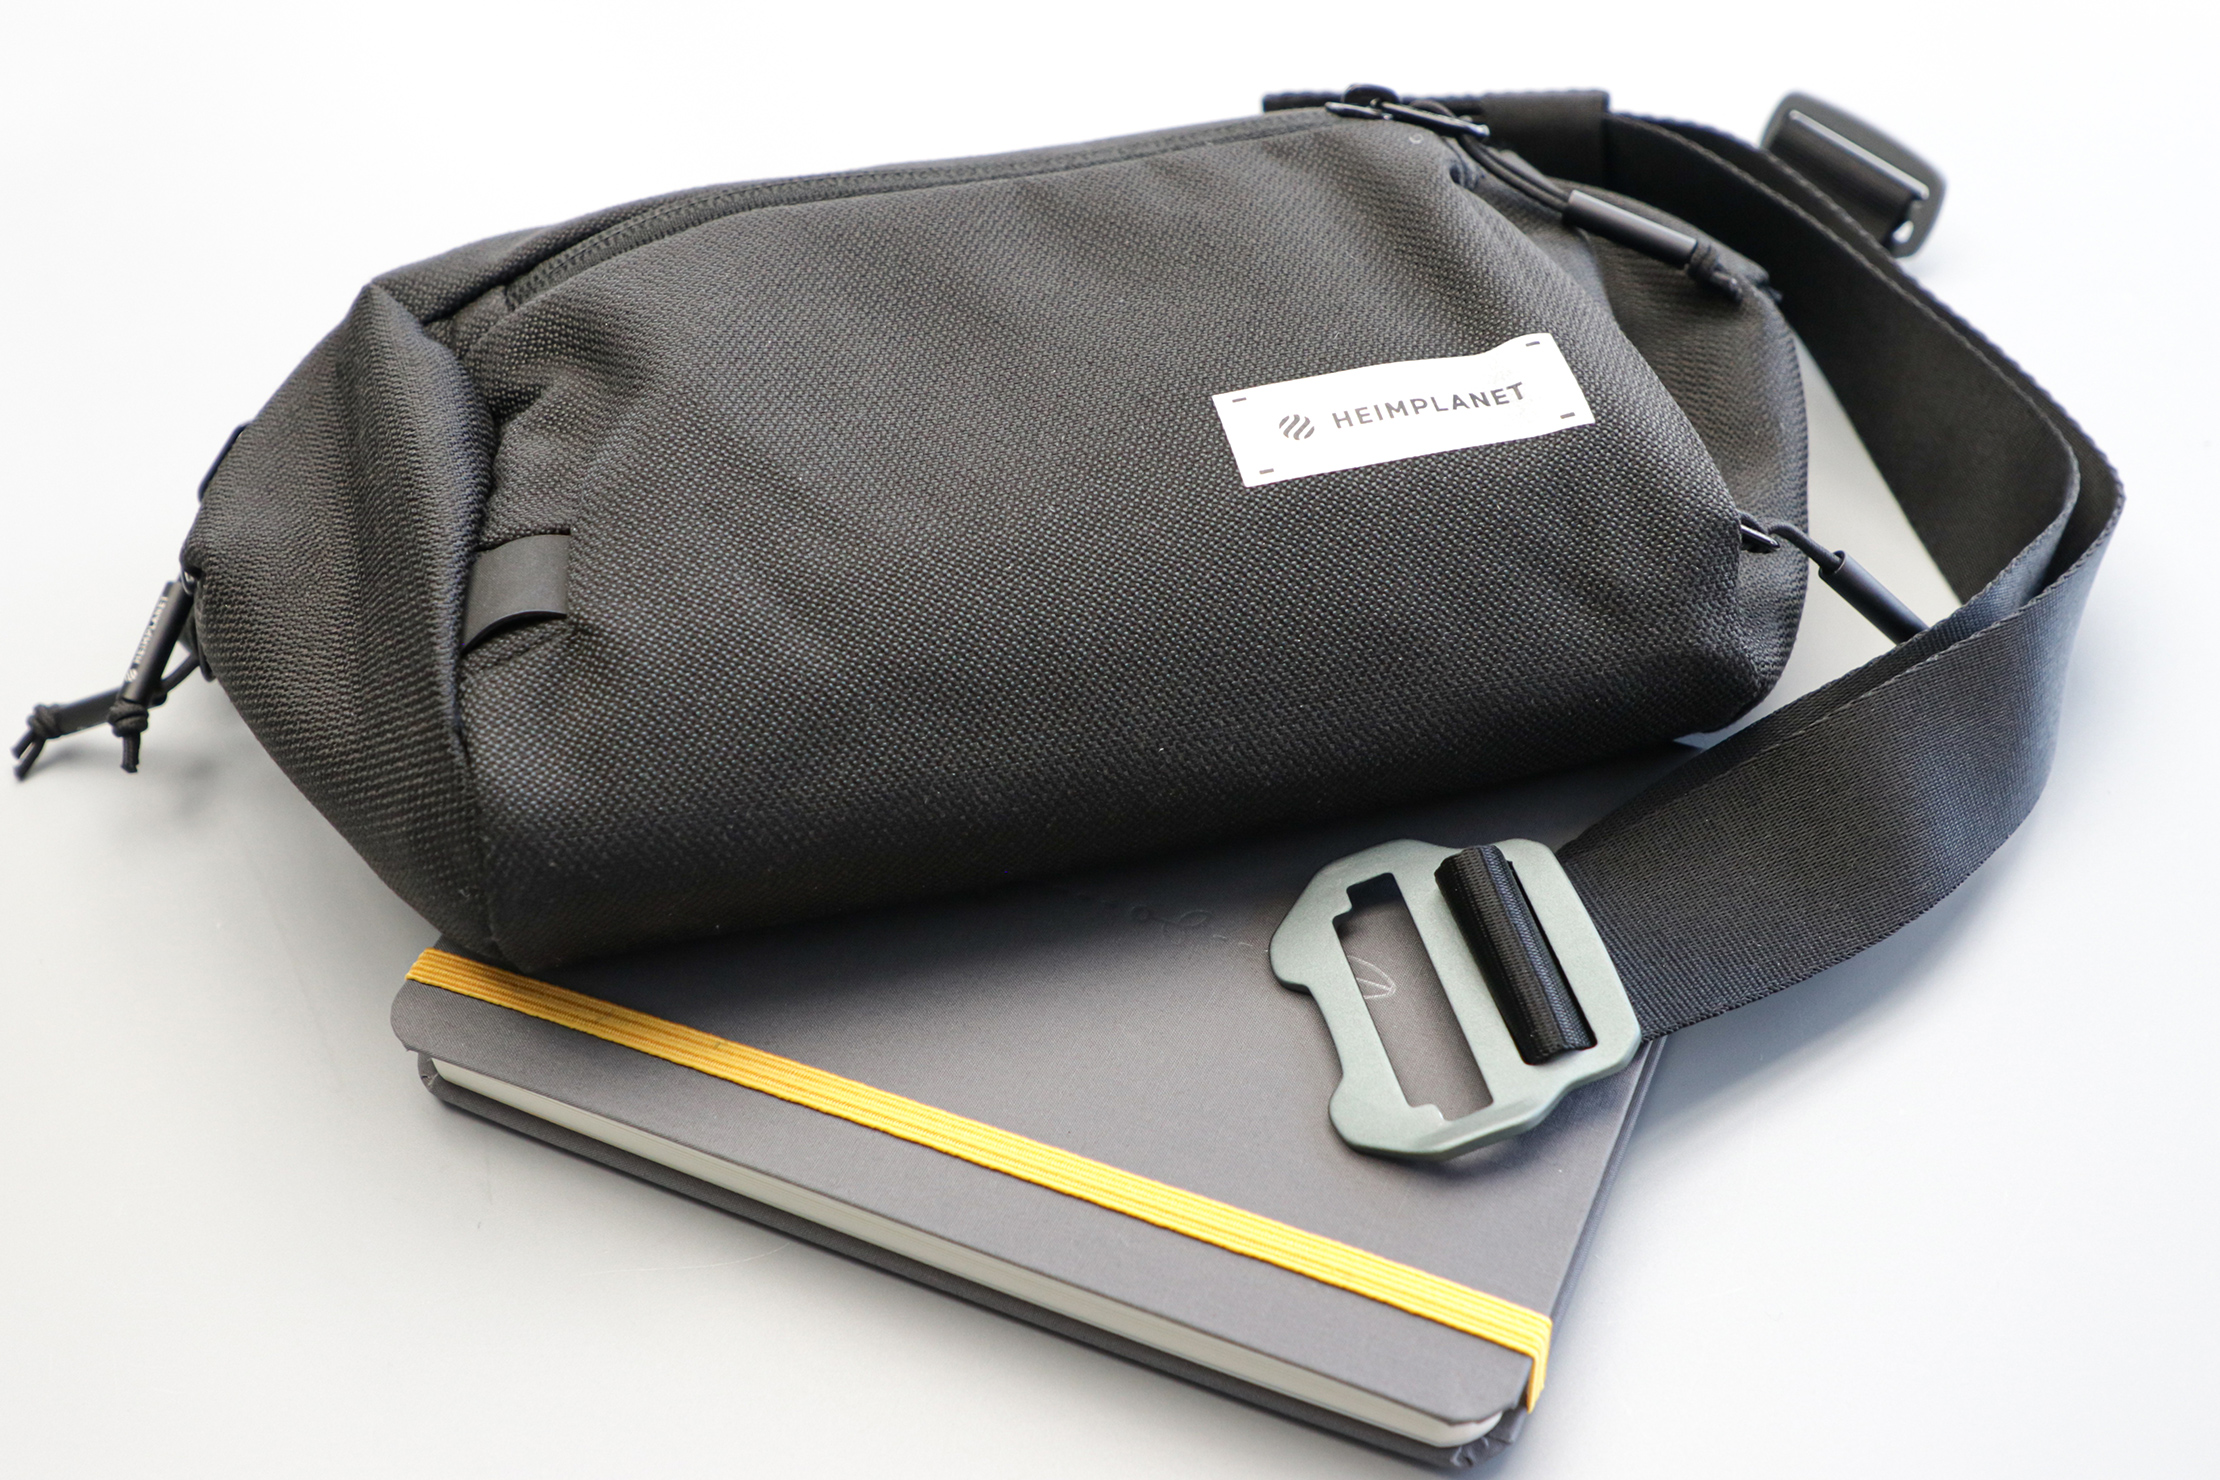 heimplanet-transit-line-sling-pocket-xl-aesthetic